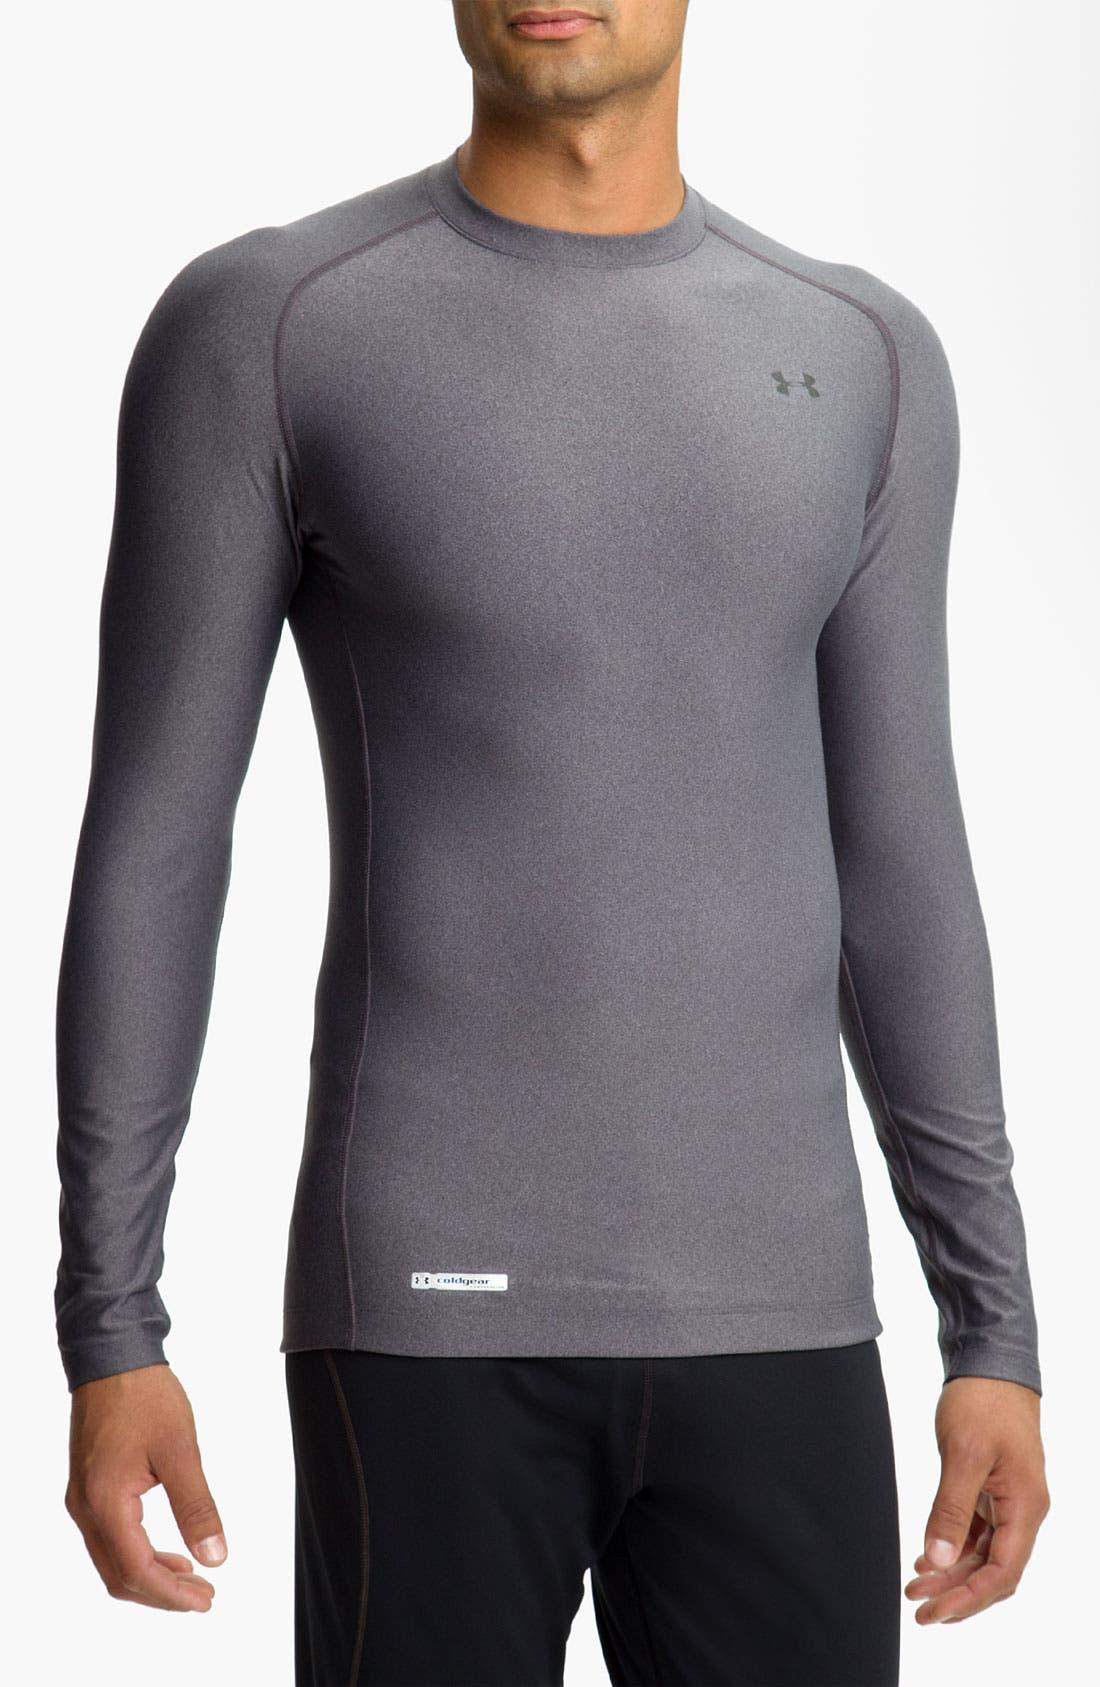 Main Image - Under Armour 'Evo' ColdGear® Compression T-Shirt (Online Exclusive)